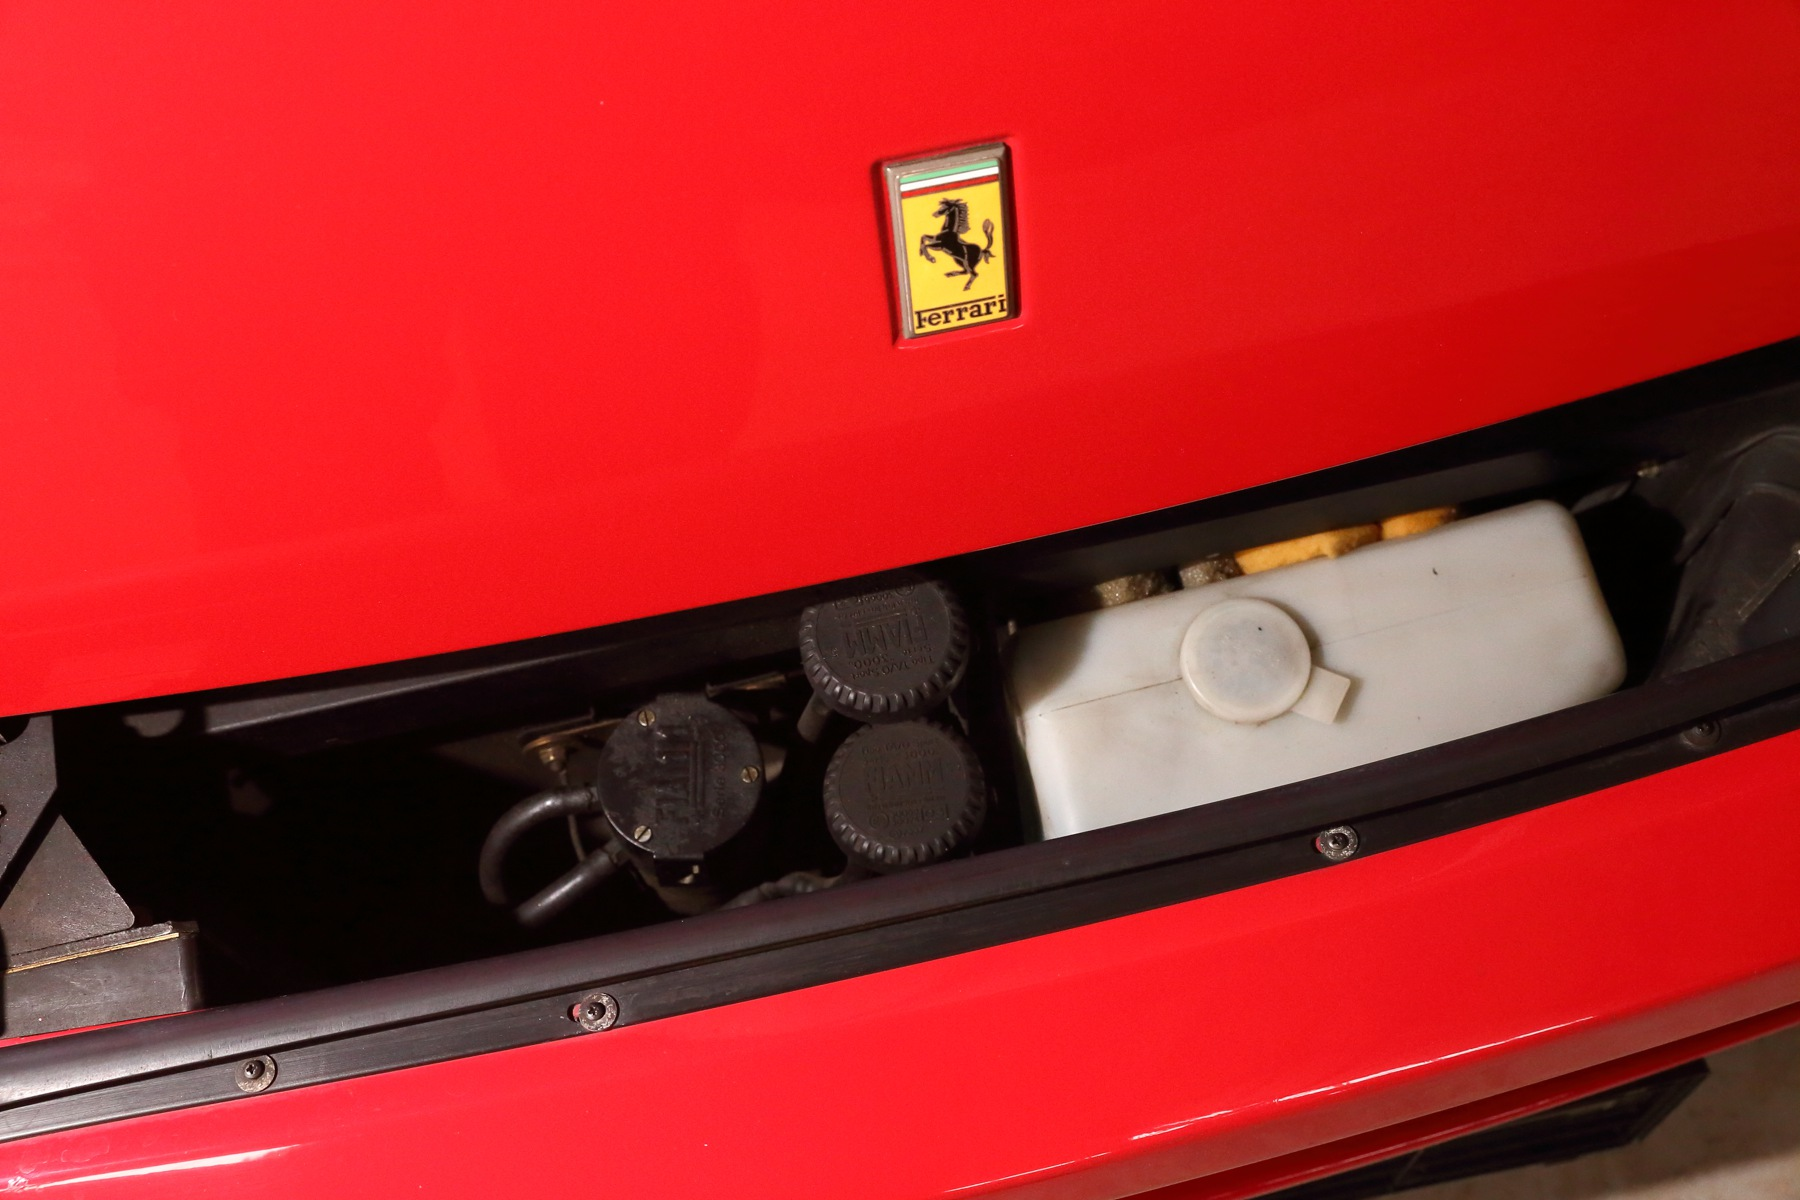 020 2016_03_16_Ferrari Testarossa I 093